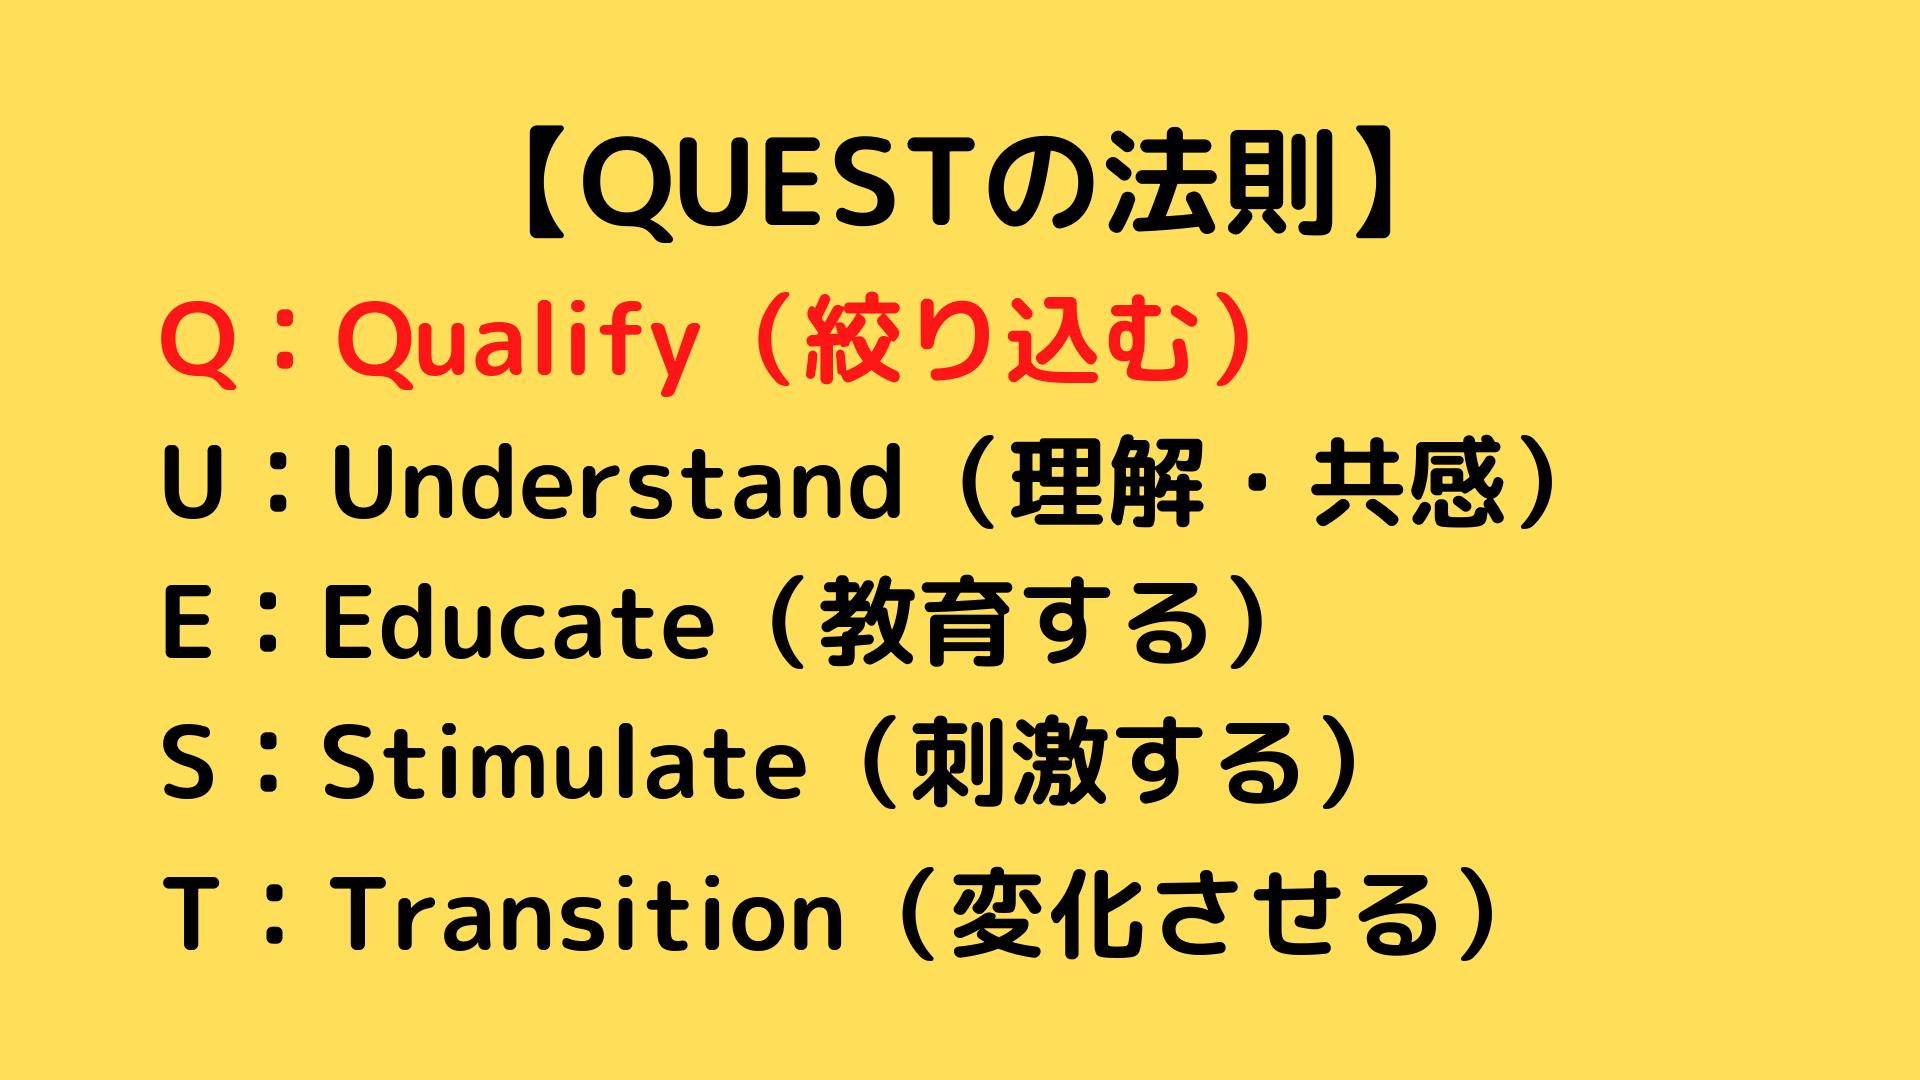 QUESTの法則 QUESTフォーミュラ 2